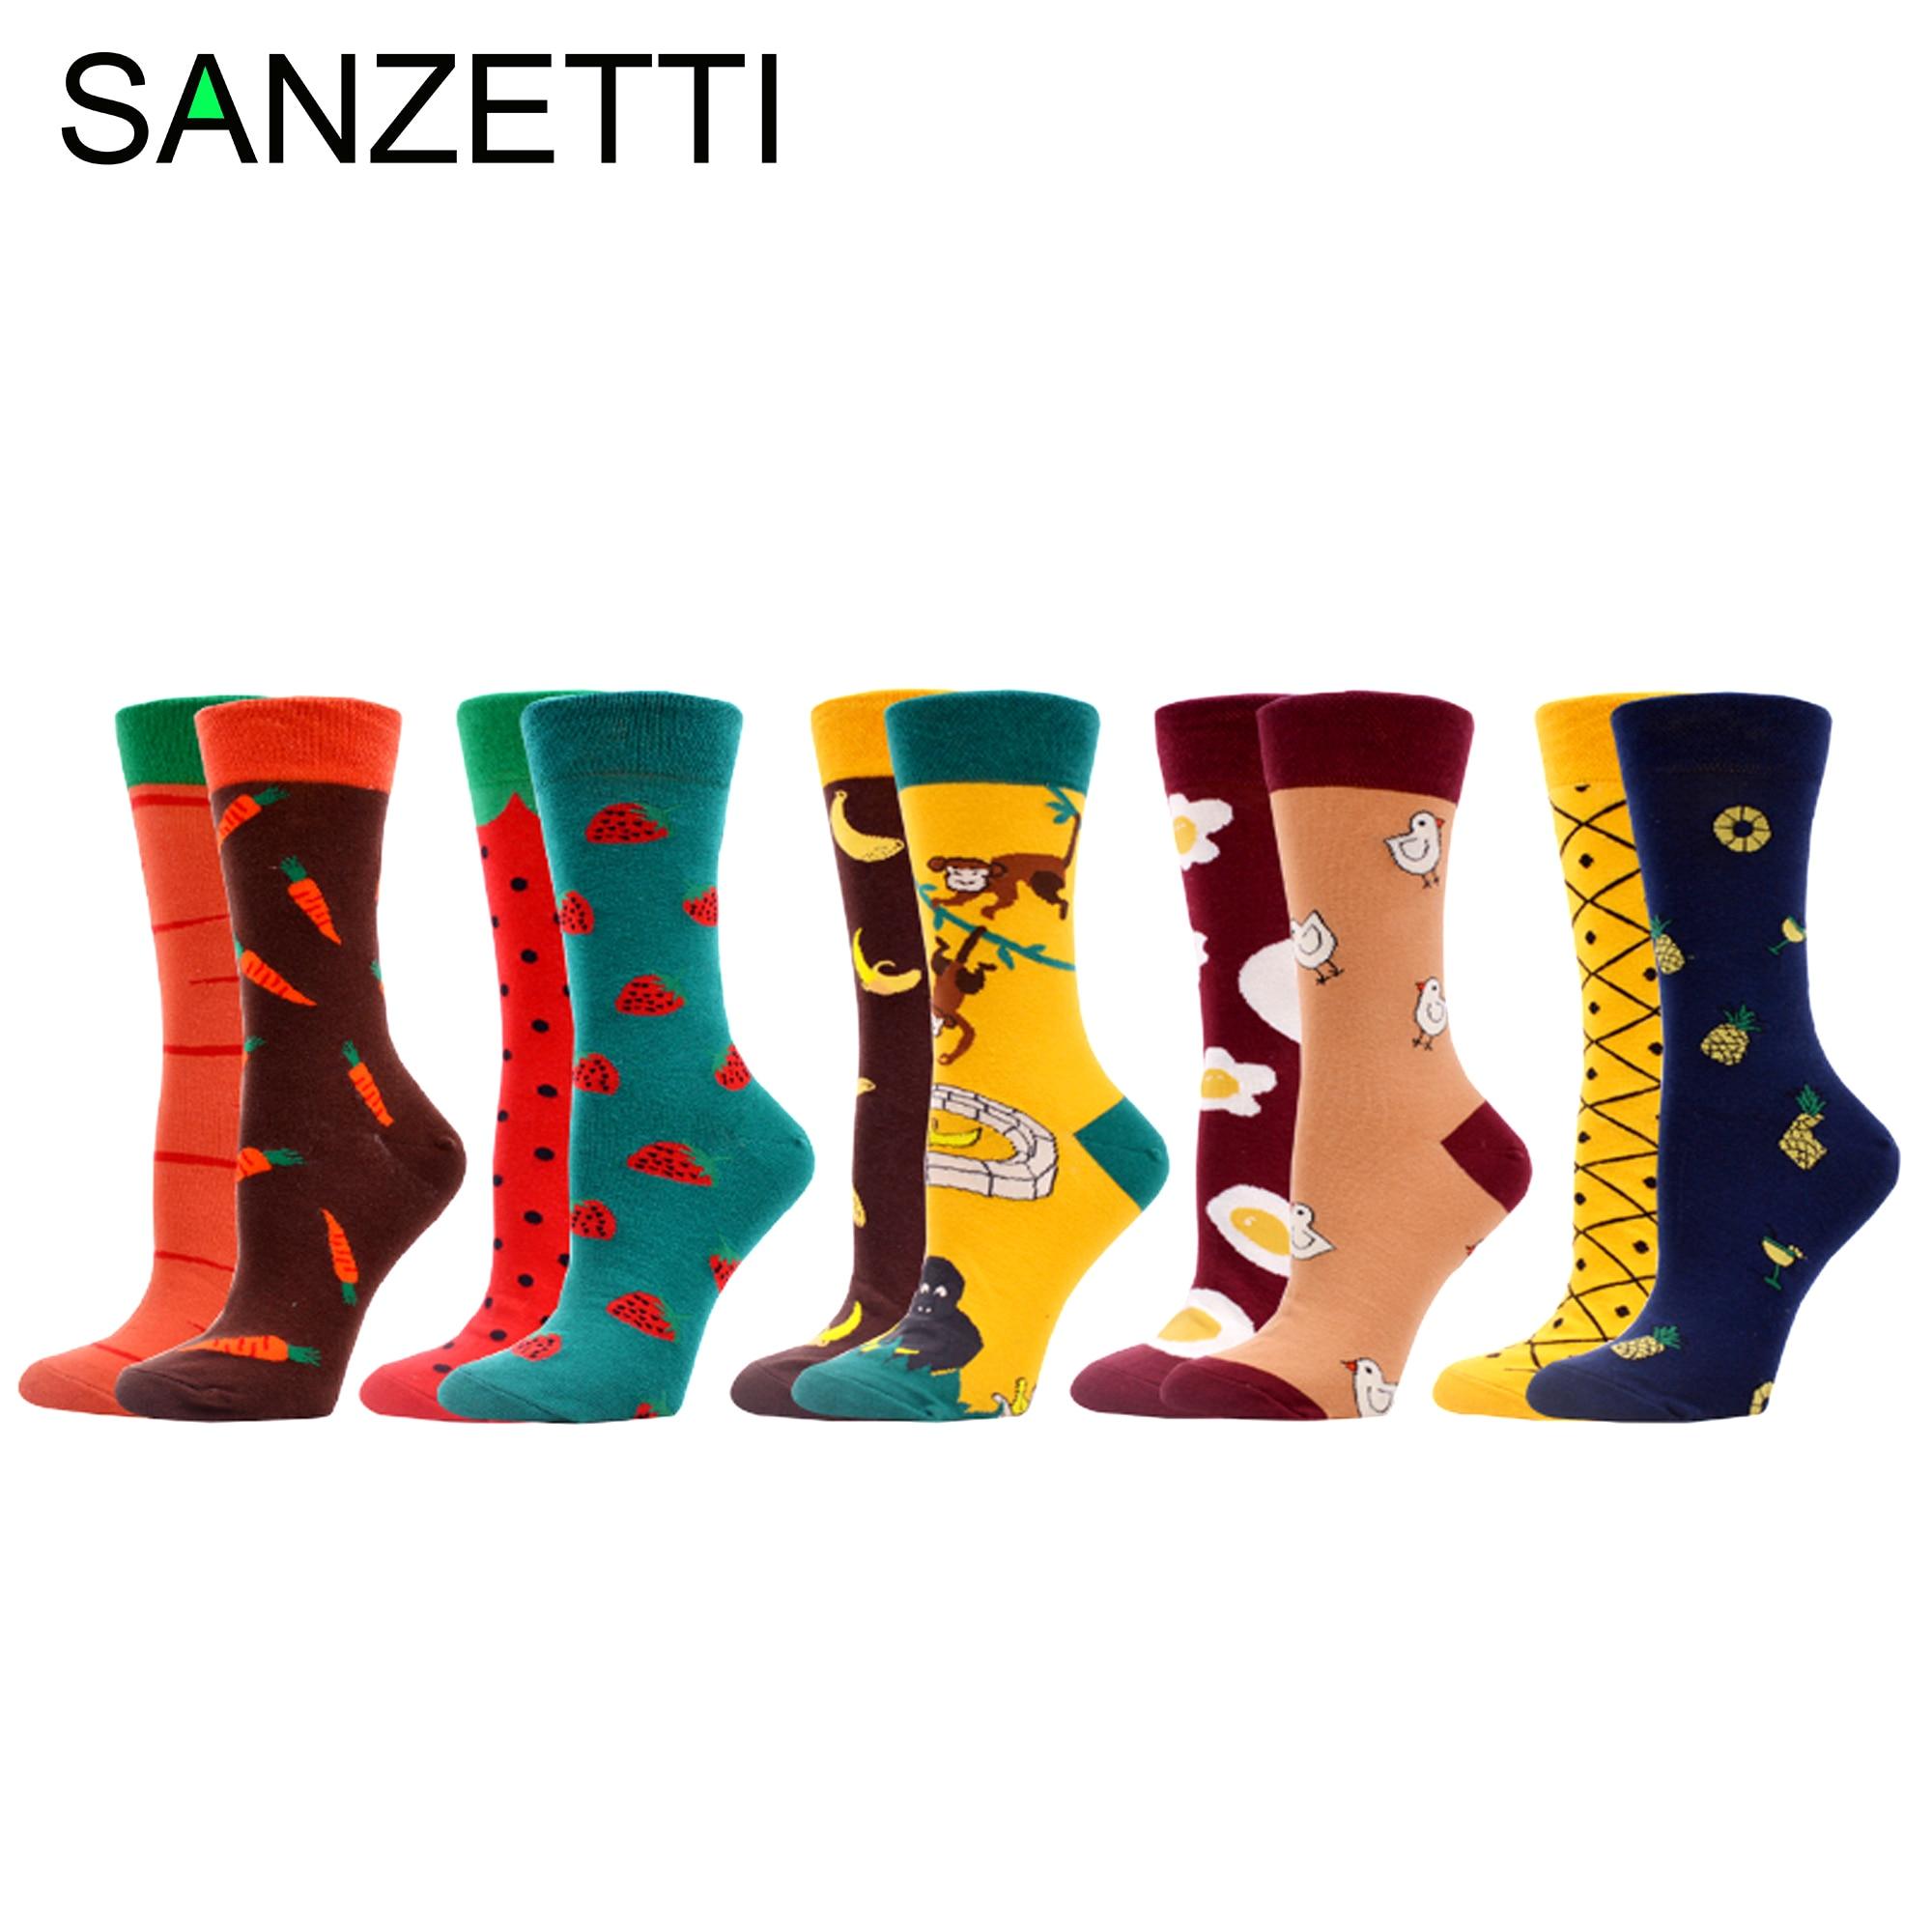 SANZETTI 5 Pairs Women's Crew Socks Happy Creative Shuangpin Design Colorful Harajuku Bright Pattern Novelty Wedding Dress Socks